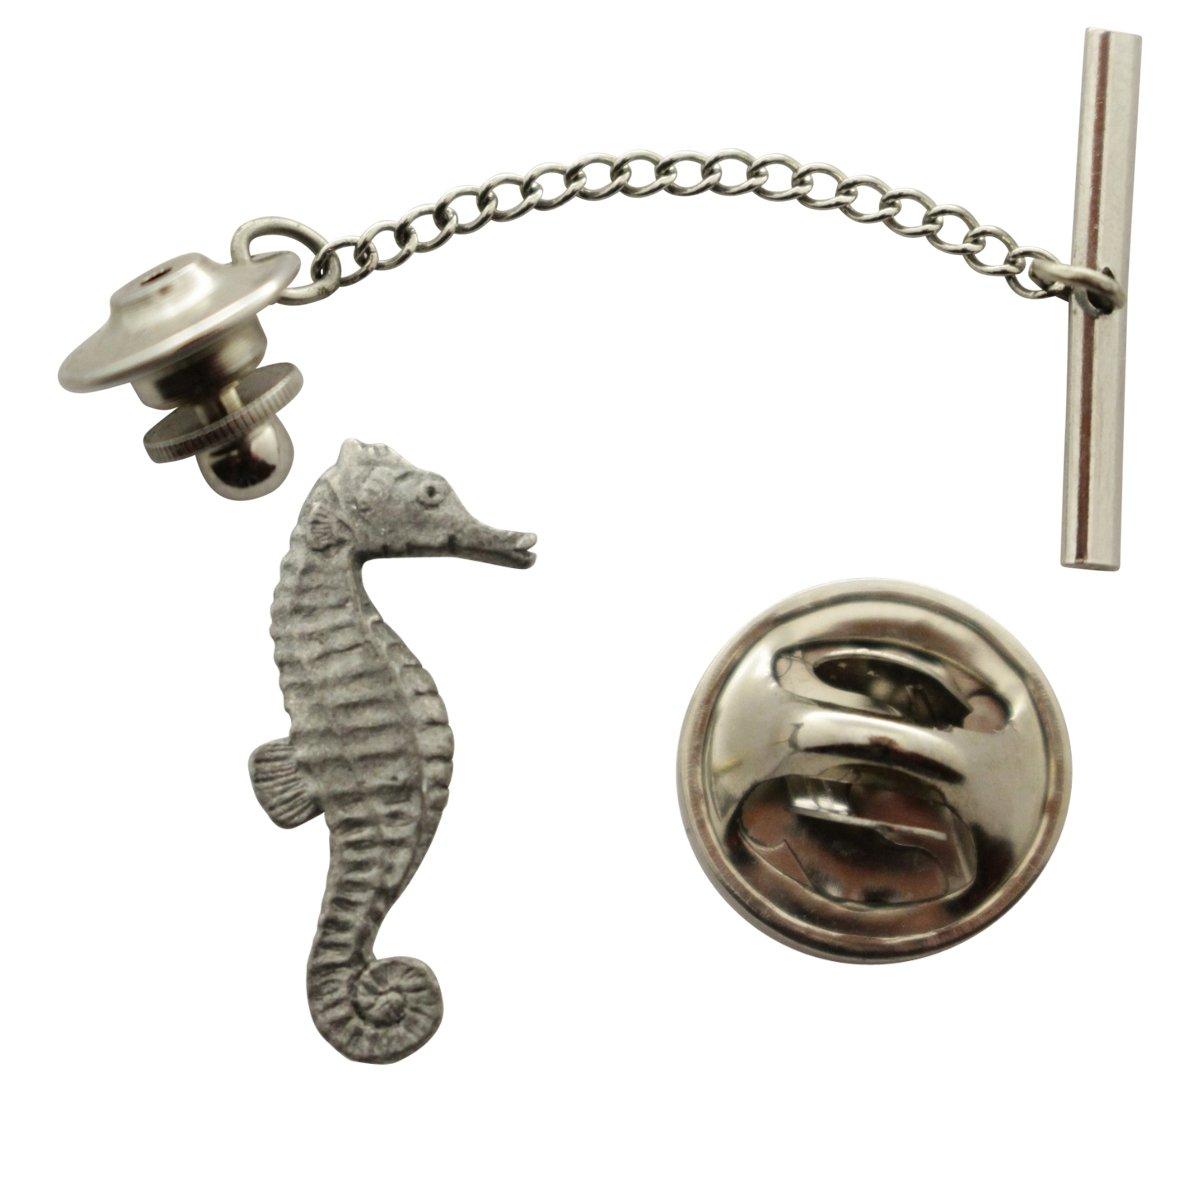 Seahorse Tie Tack ~ Antiqued Pewter ~ Tie Tack or Pin ~ Sarah's Treats & Treasures